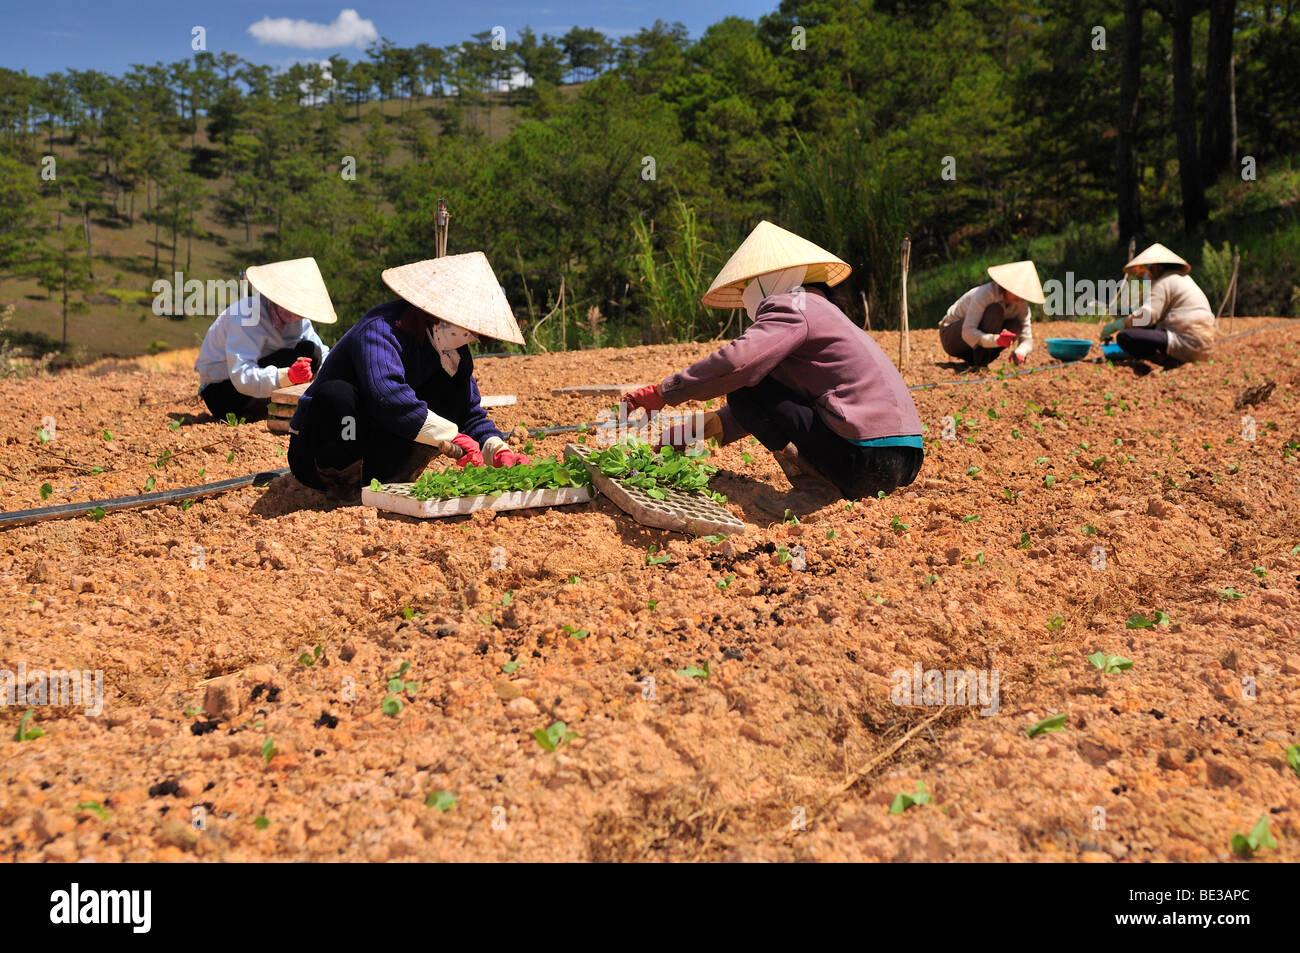 Planting salad, several women planting seedlings, field work, Dalat, Central Highlands, Vietnam, Asia - Stock Image